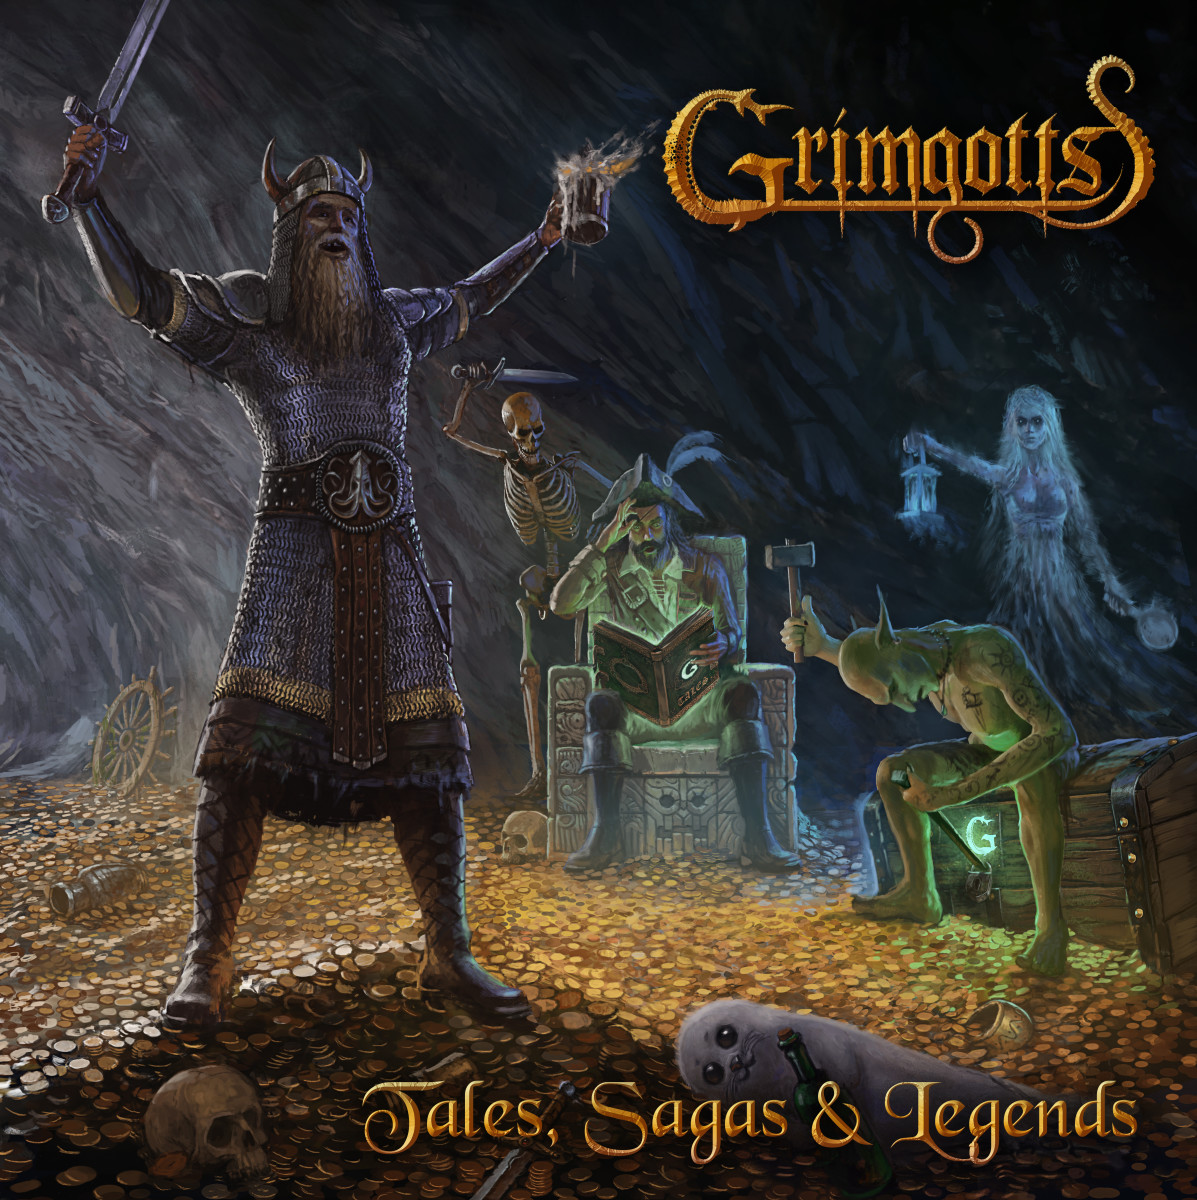 Grimgotts,